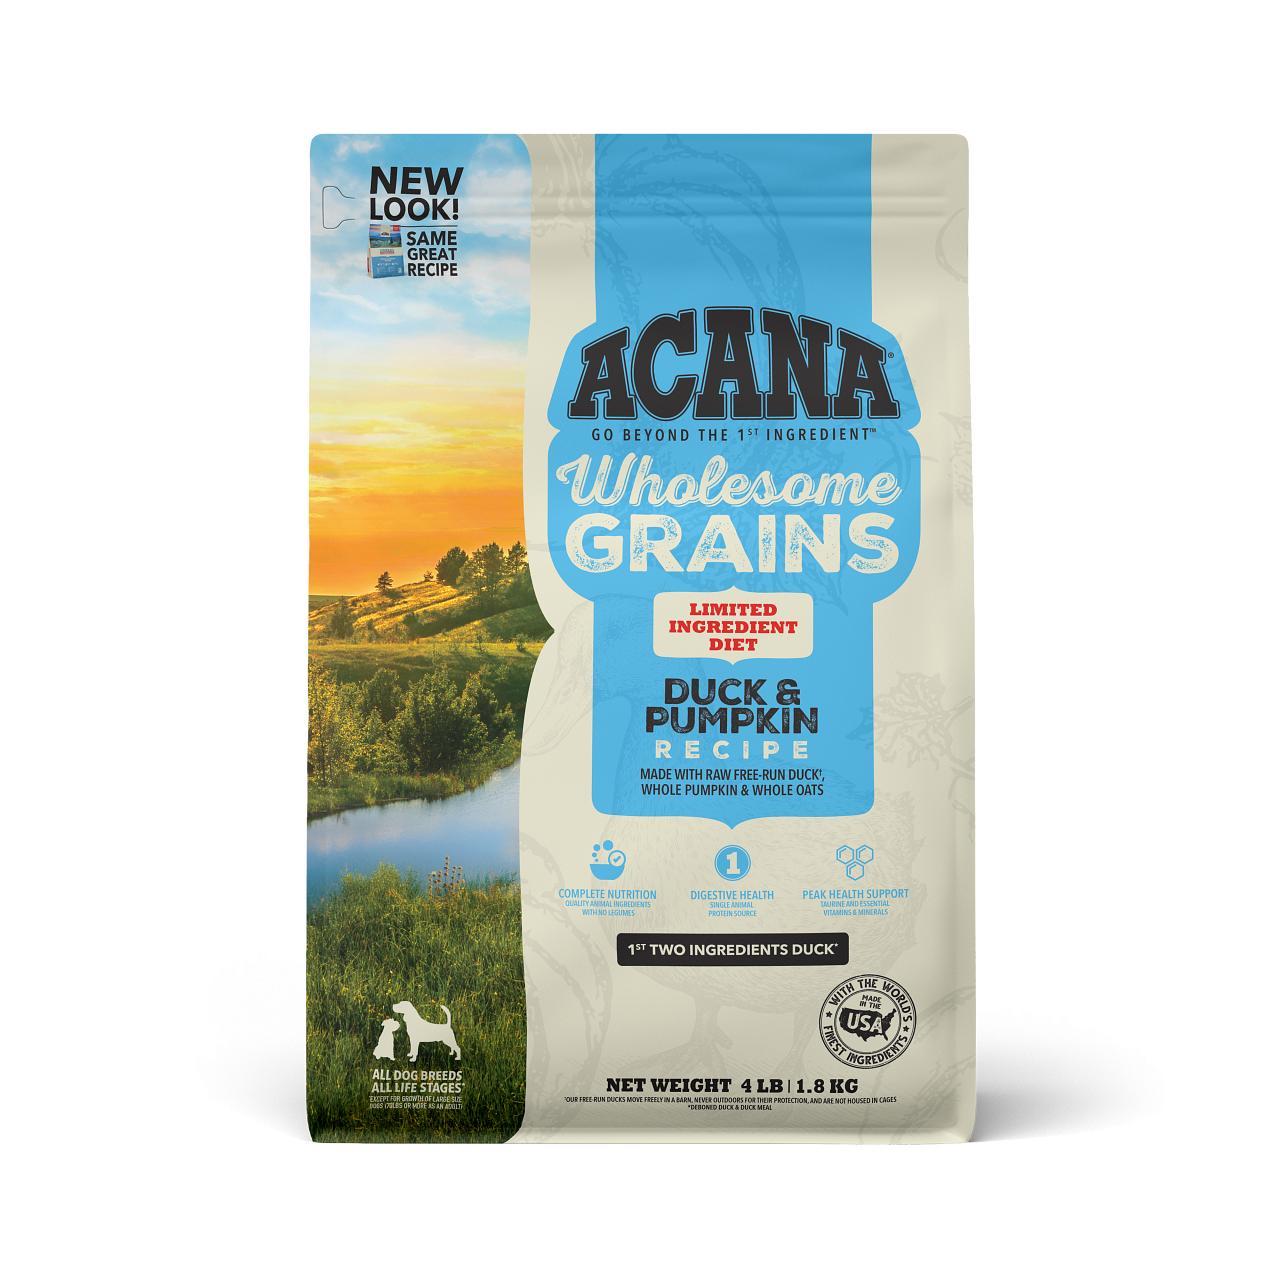 ACANA Wholesome Grains Duck & Pumpkin Dry Dog Food, 4-lb